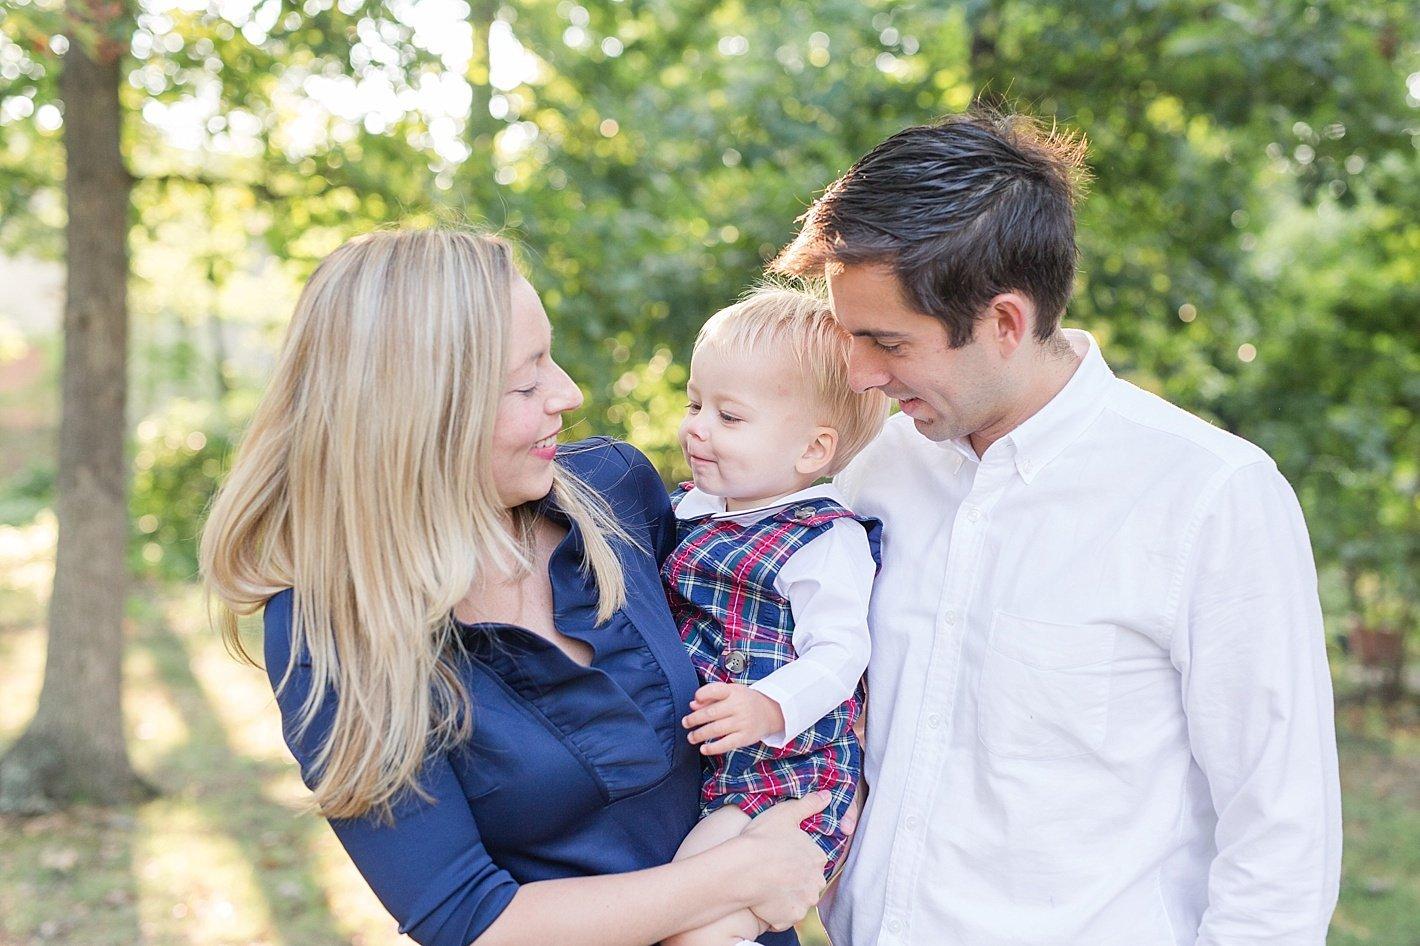 Howard_County_family_photographer_arpasi_photography-11